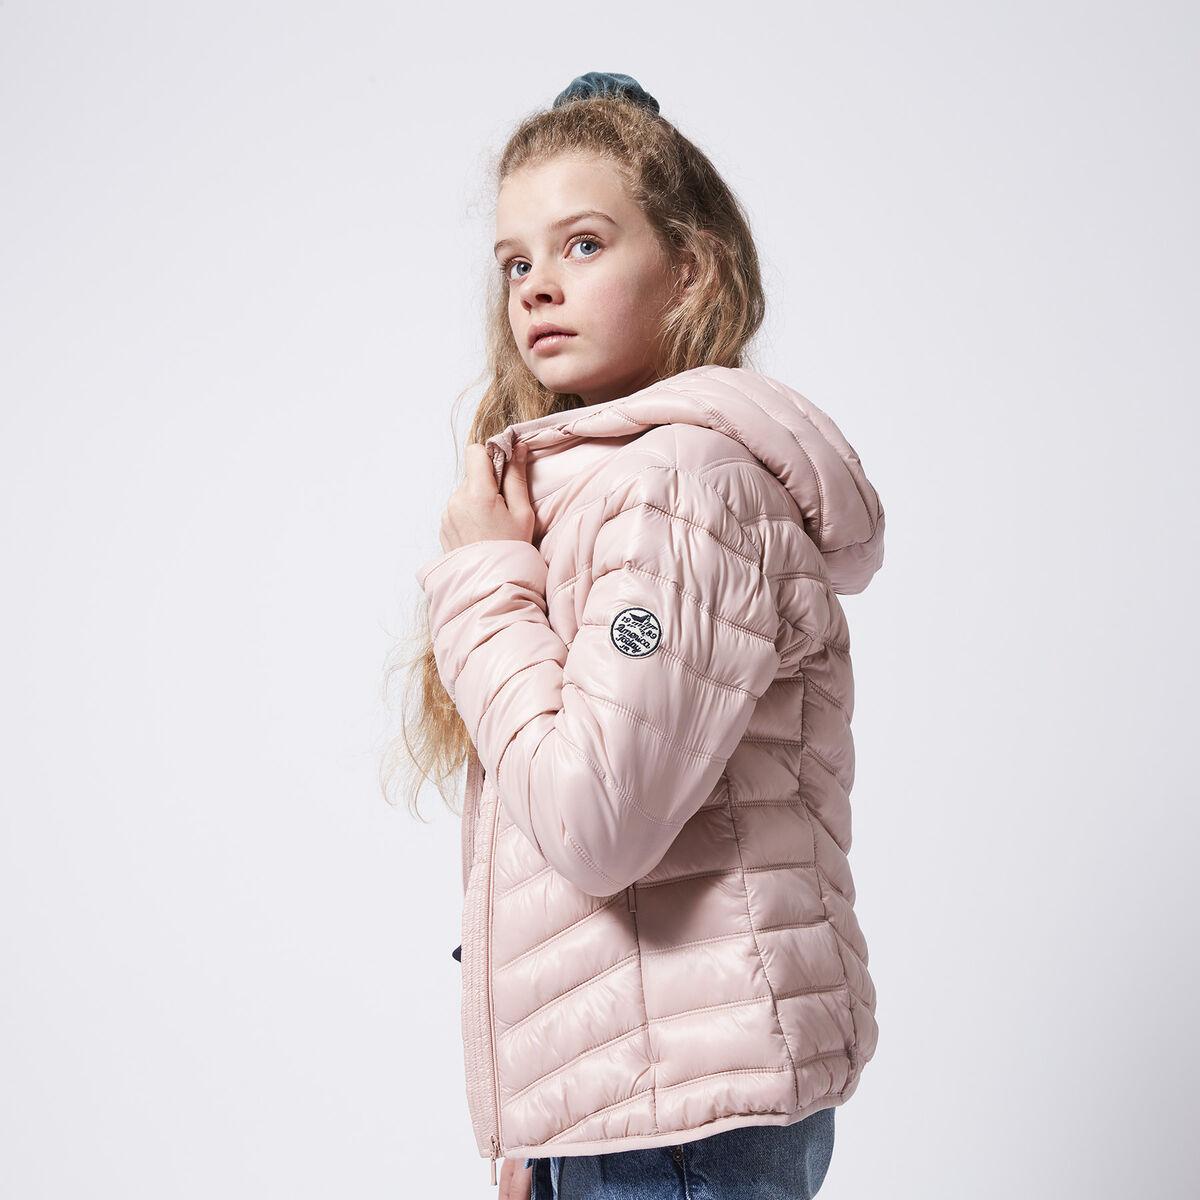 Jacket Alice Jr.